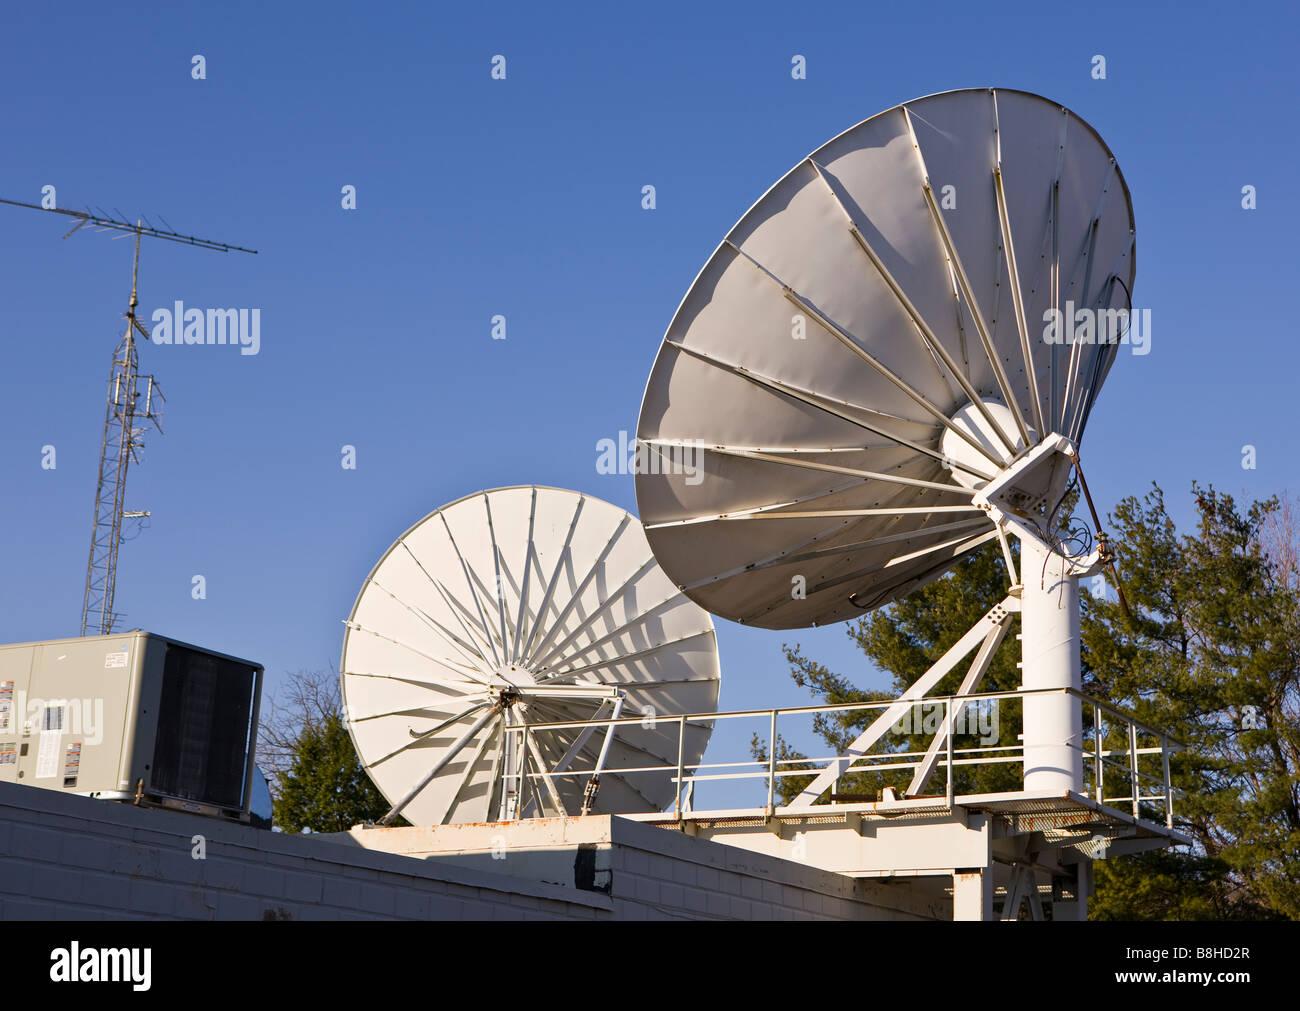 arlington virginia usa satellite dish for cable tv on roof stock photo 22511071 alamy. Black Bedroom Furniture Sets. Home Design Ideas